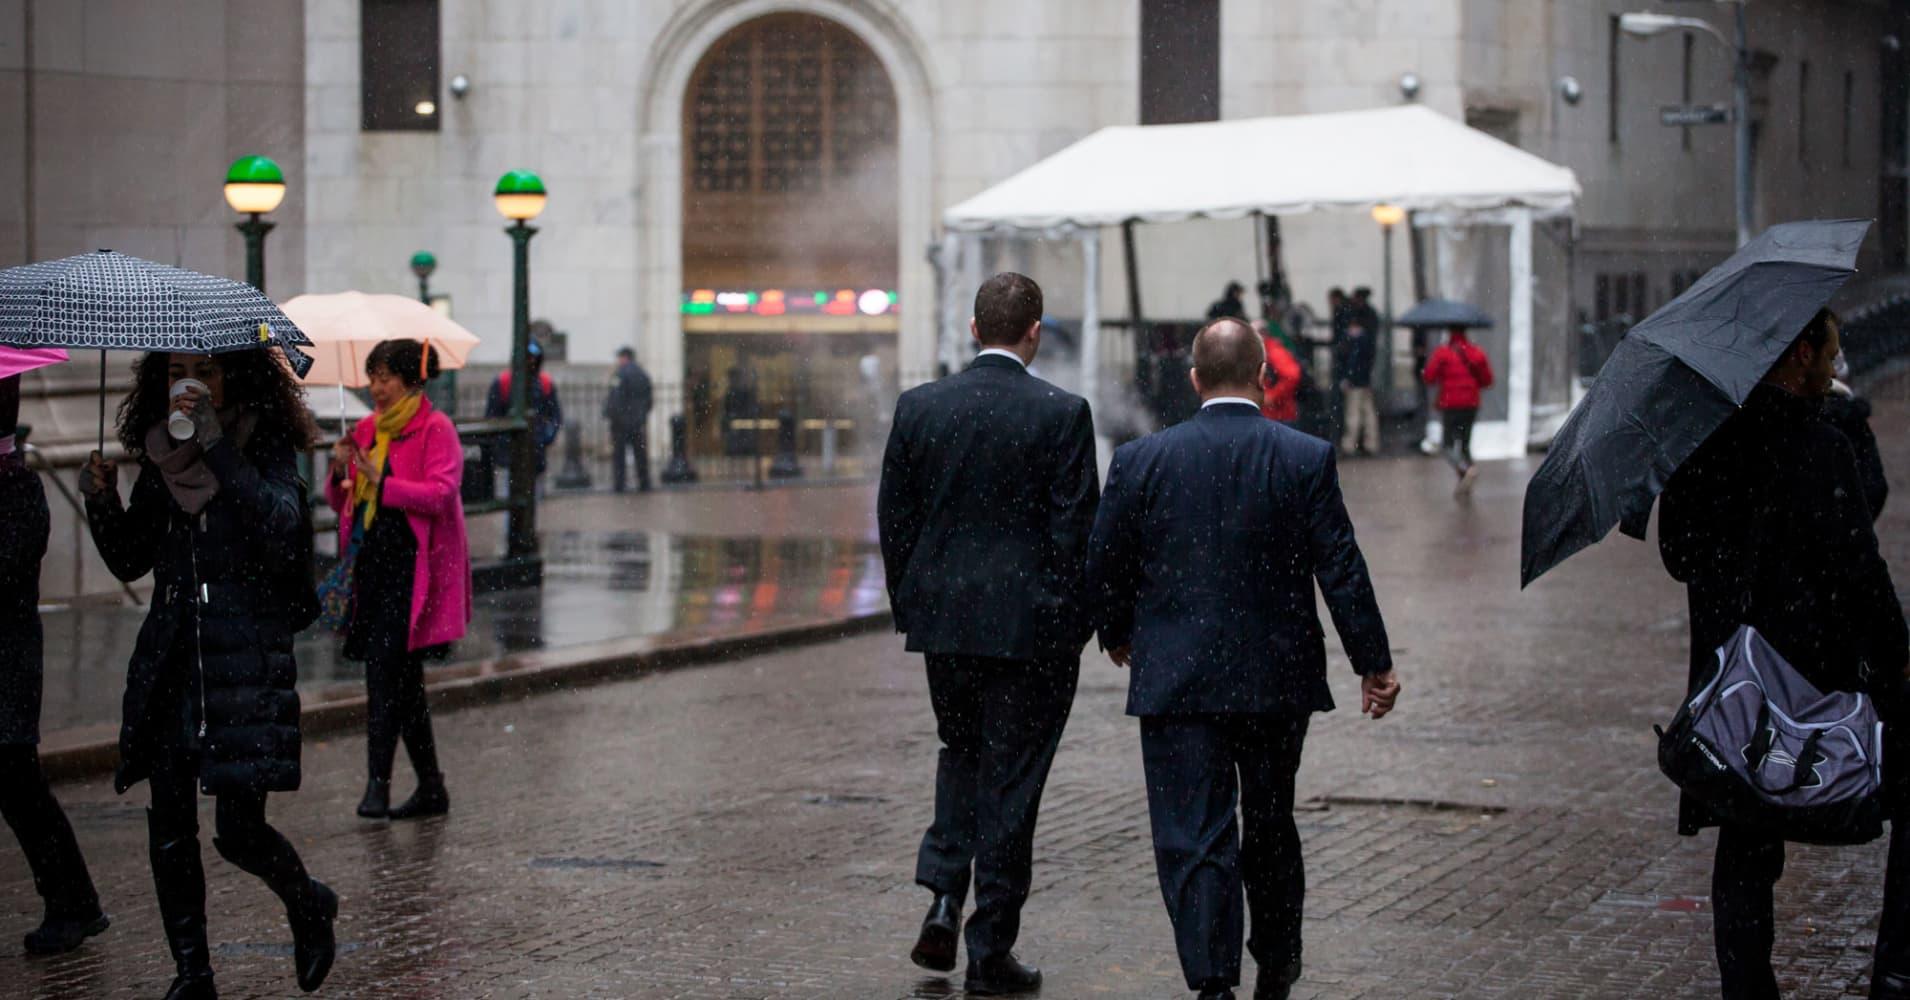 Bond, stock trading revenues drop on sleepy Wall Street